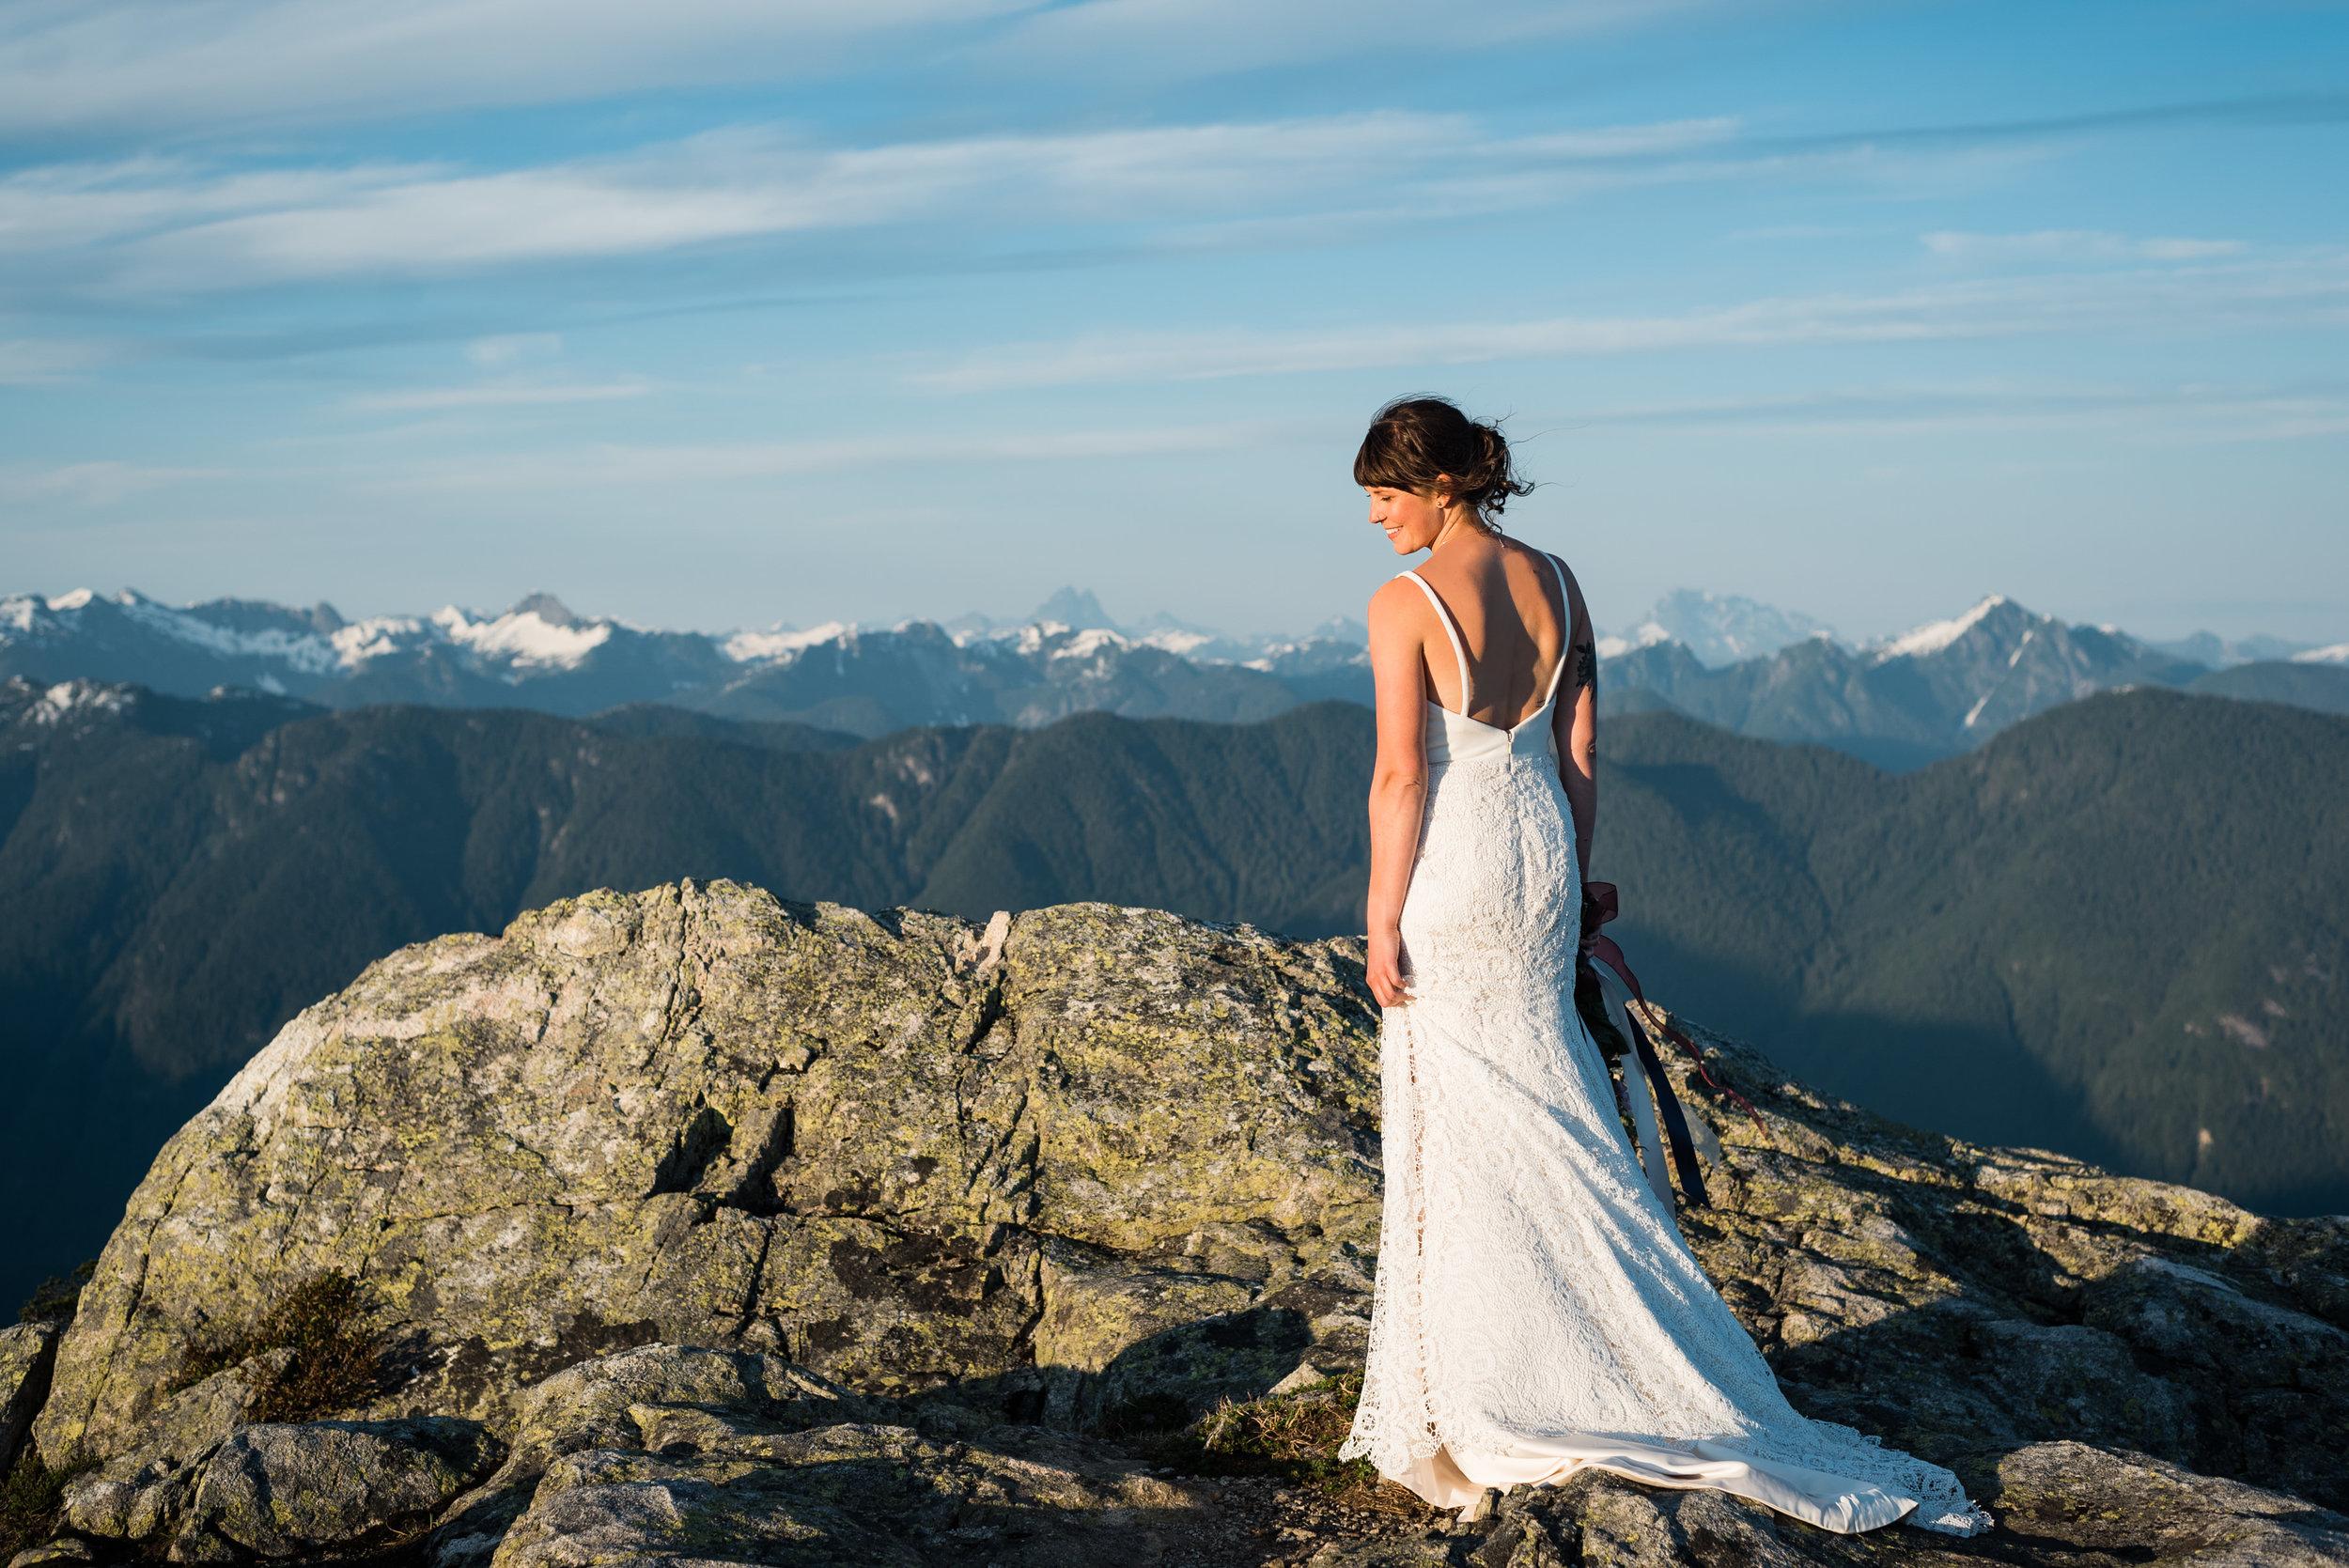 Mt-Seymour-styled-shoot-0052-jelger-tanja-photographers.jpg